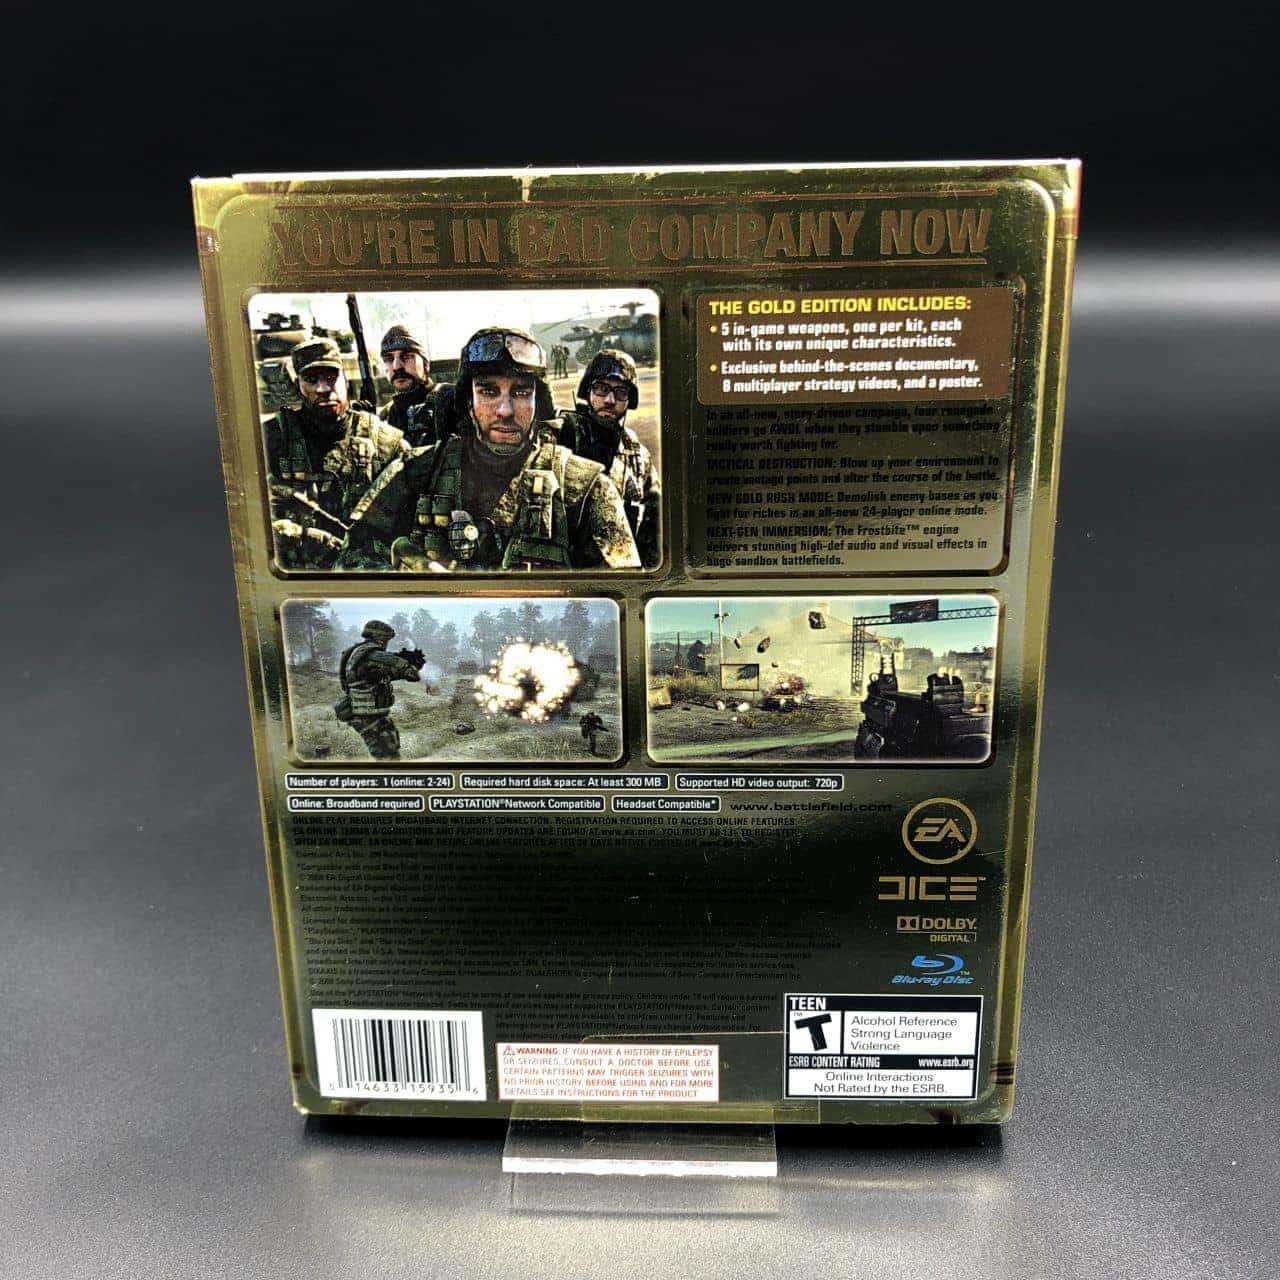 PS3 Battlefield: Bad Company (Import) (Gold Edition) (Komplett) (Sehr gut) Sony PlayStation 3 (FSK18)